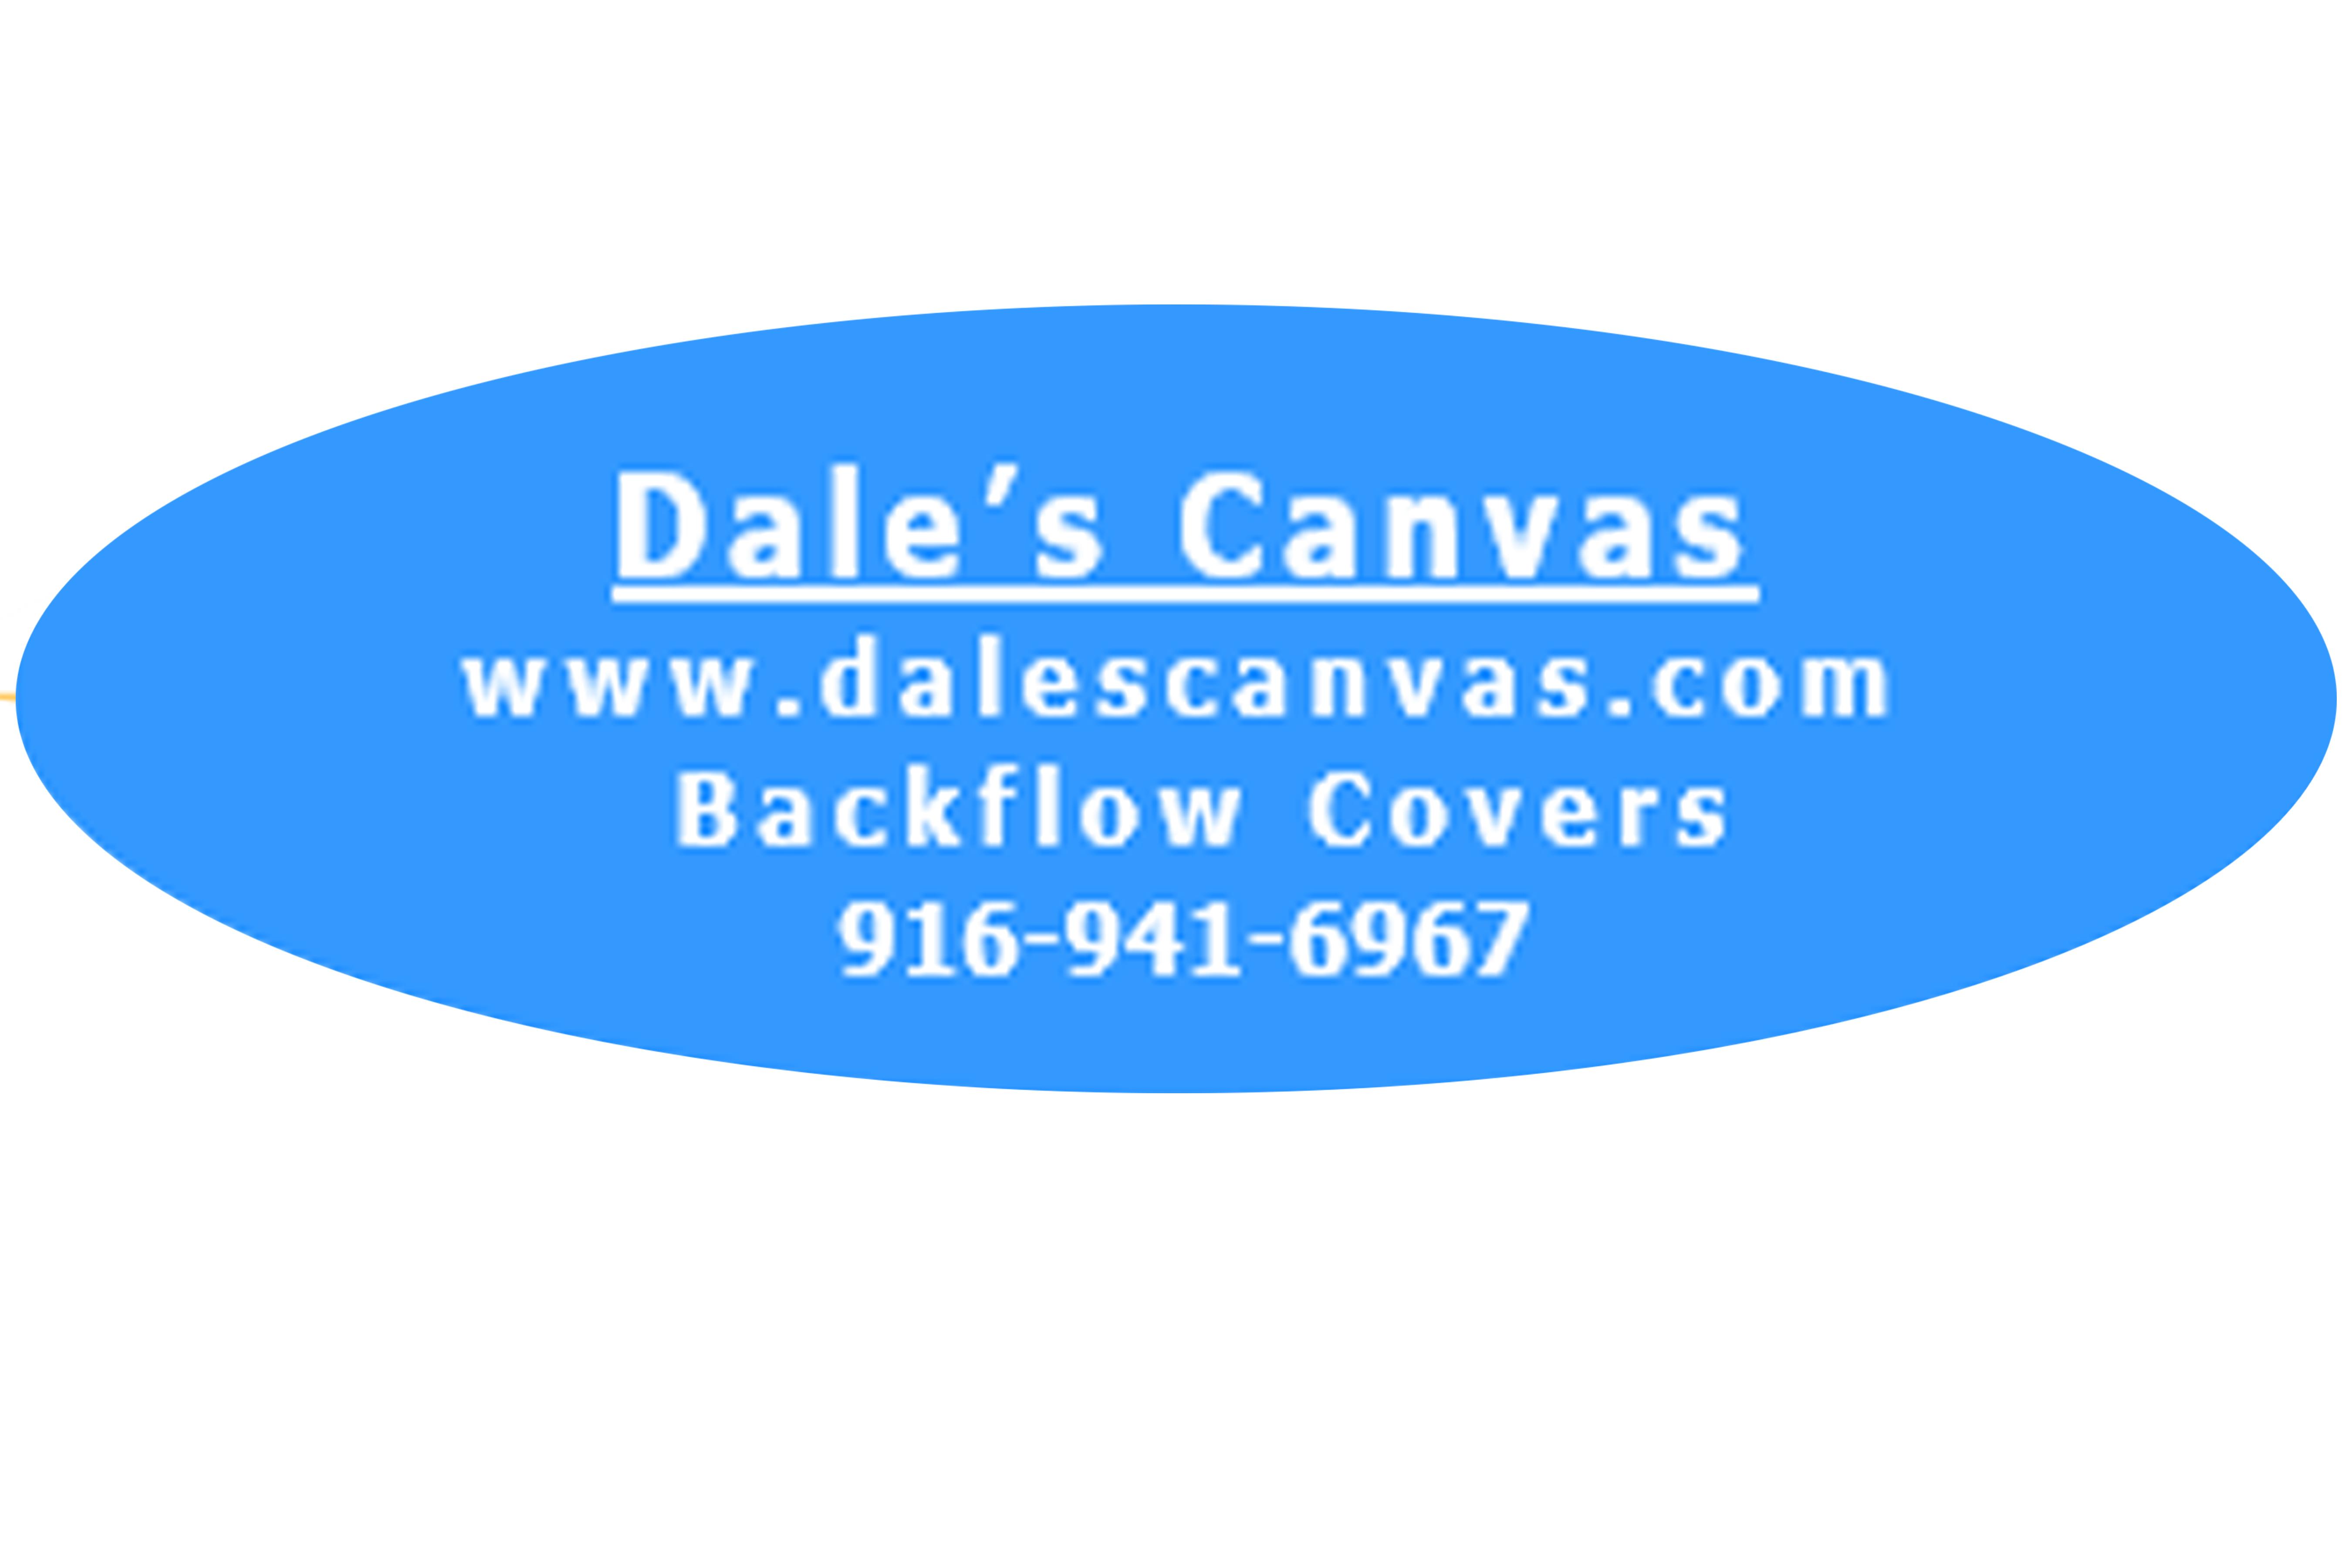 Dale's Canvas